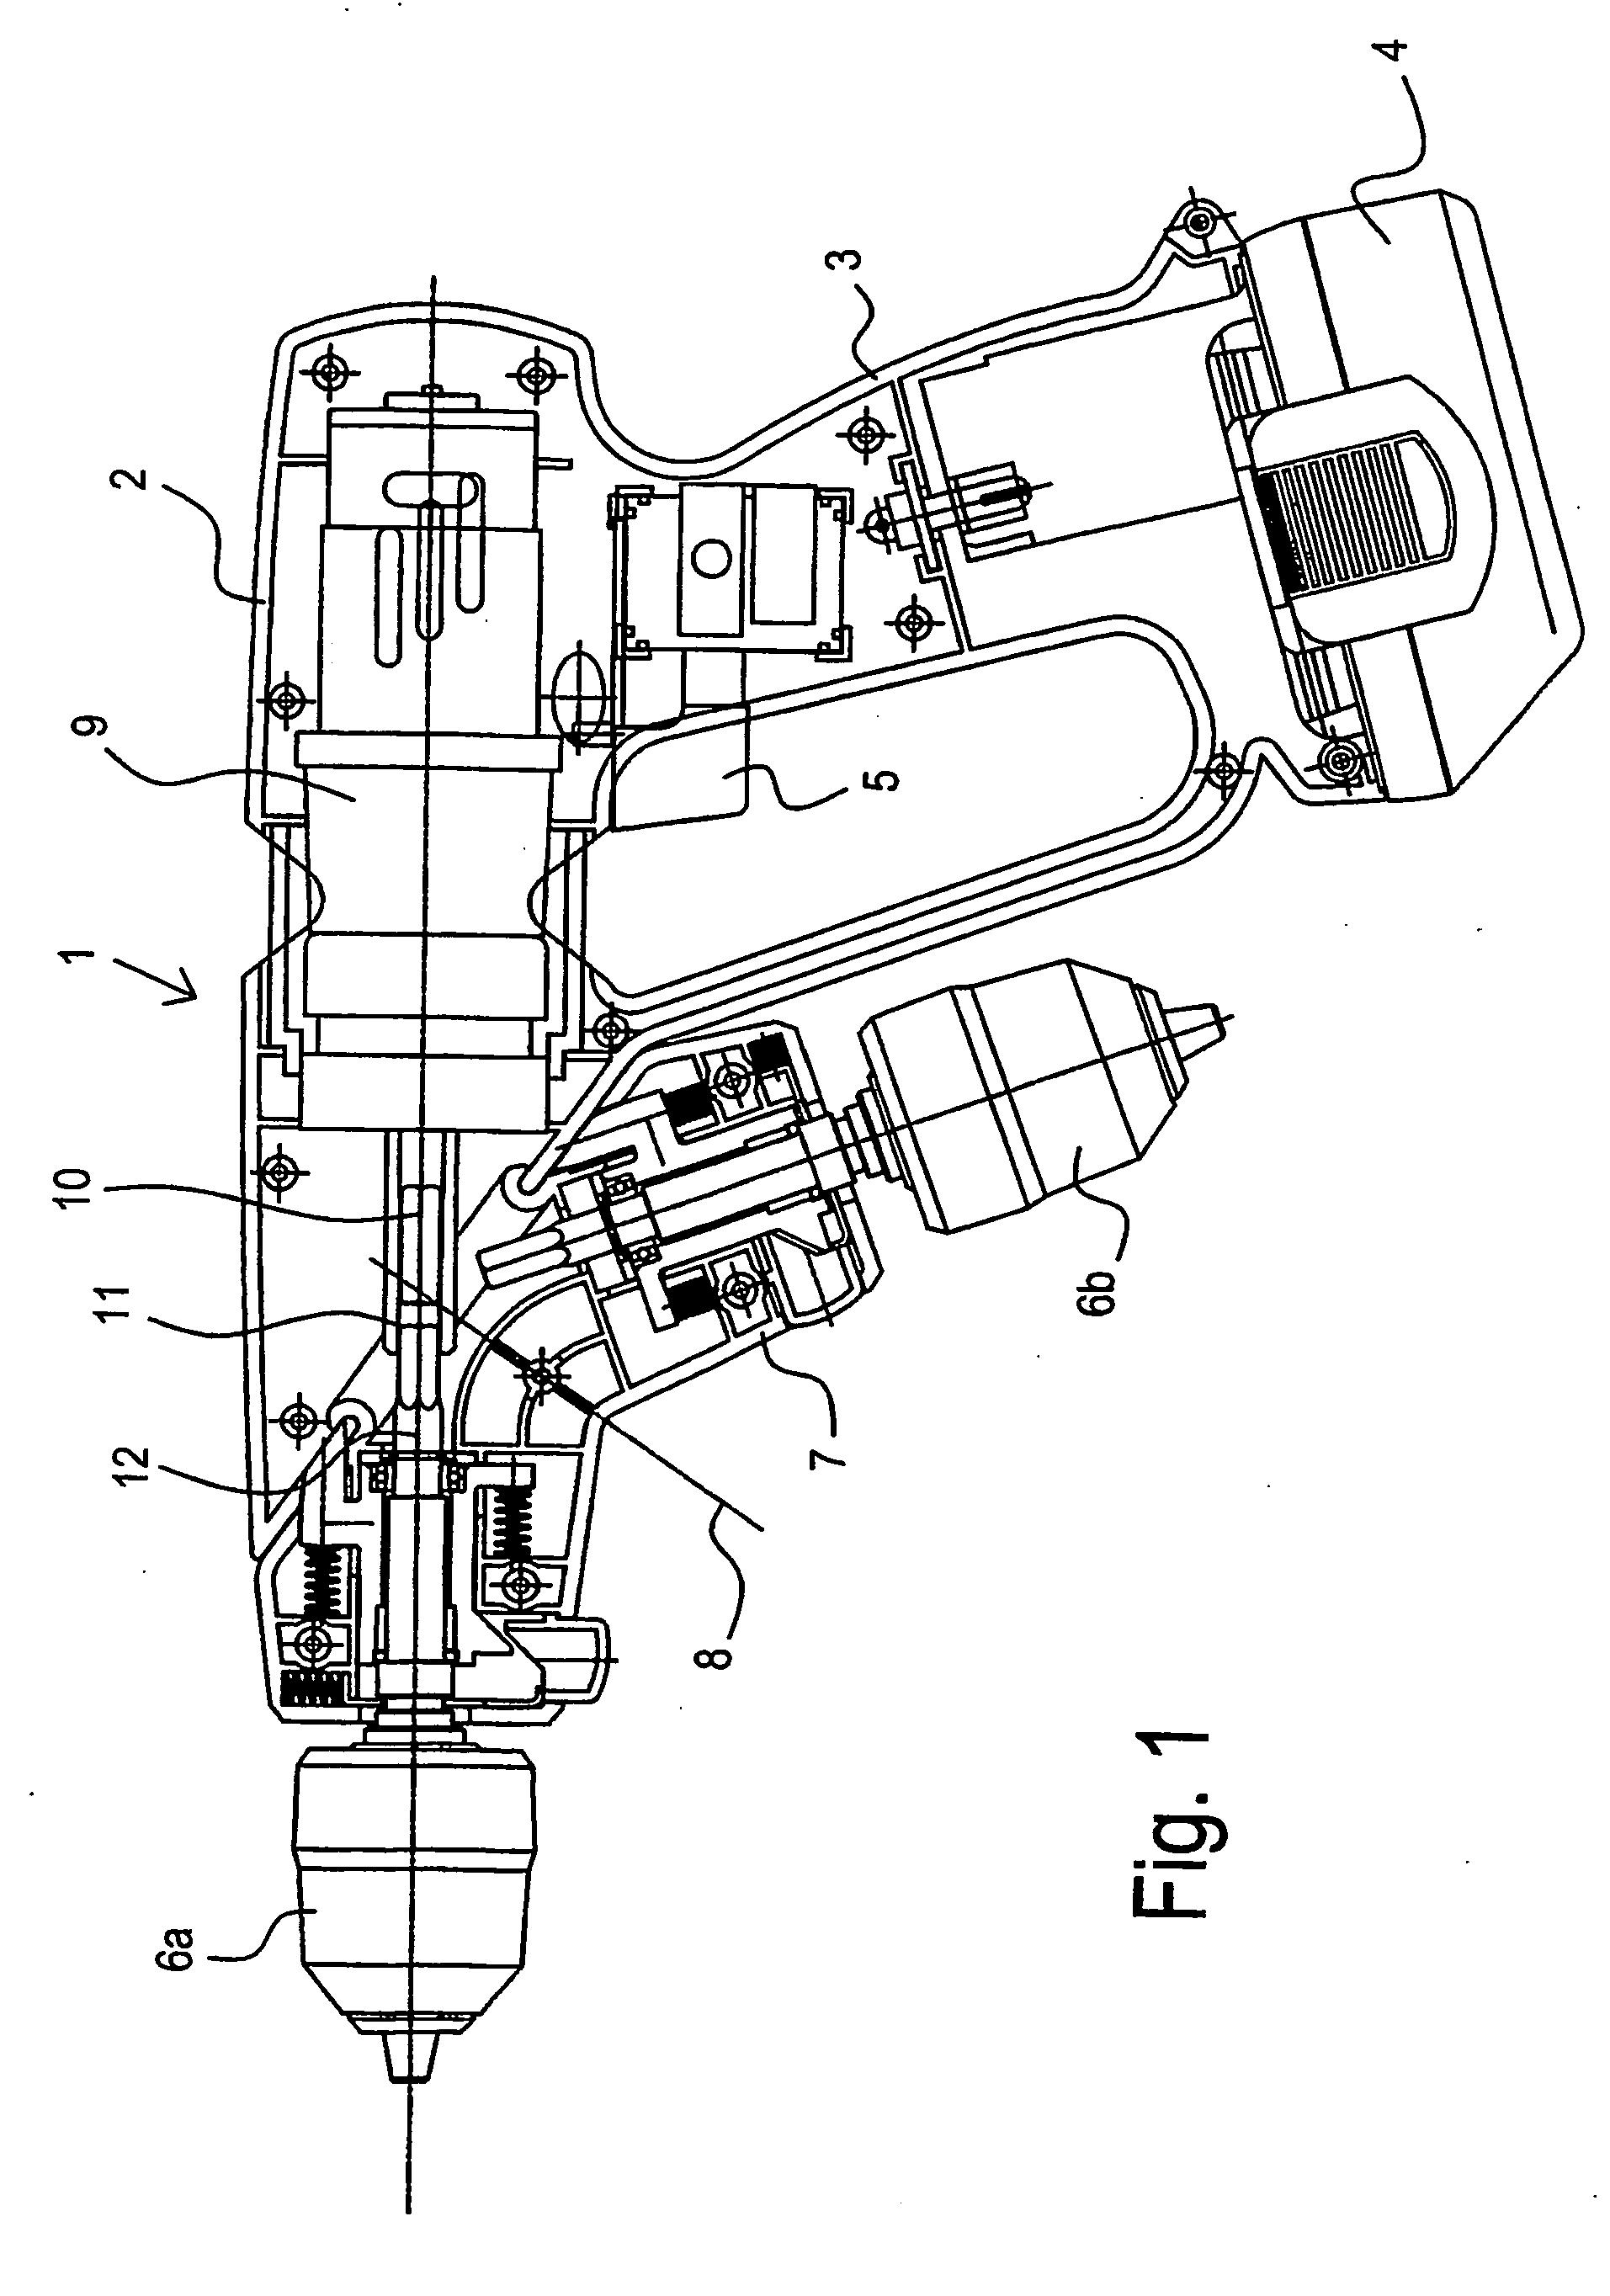 Diagram By Lbweaver27 On 602 P1